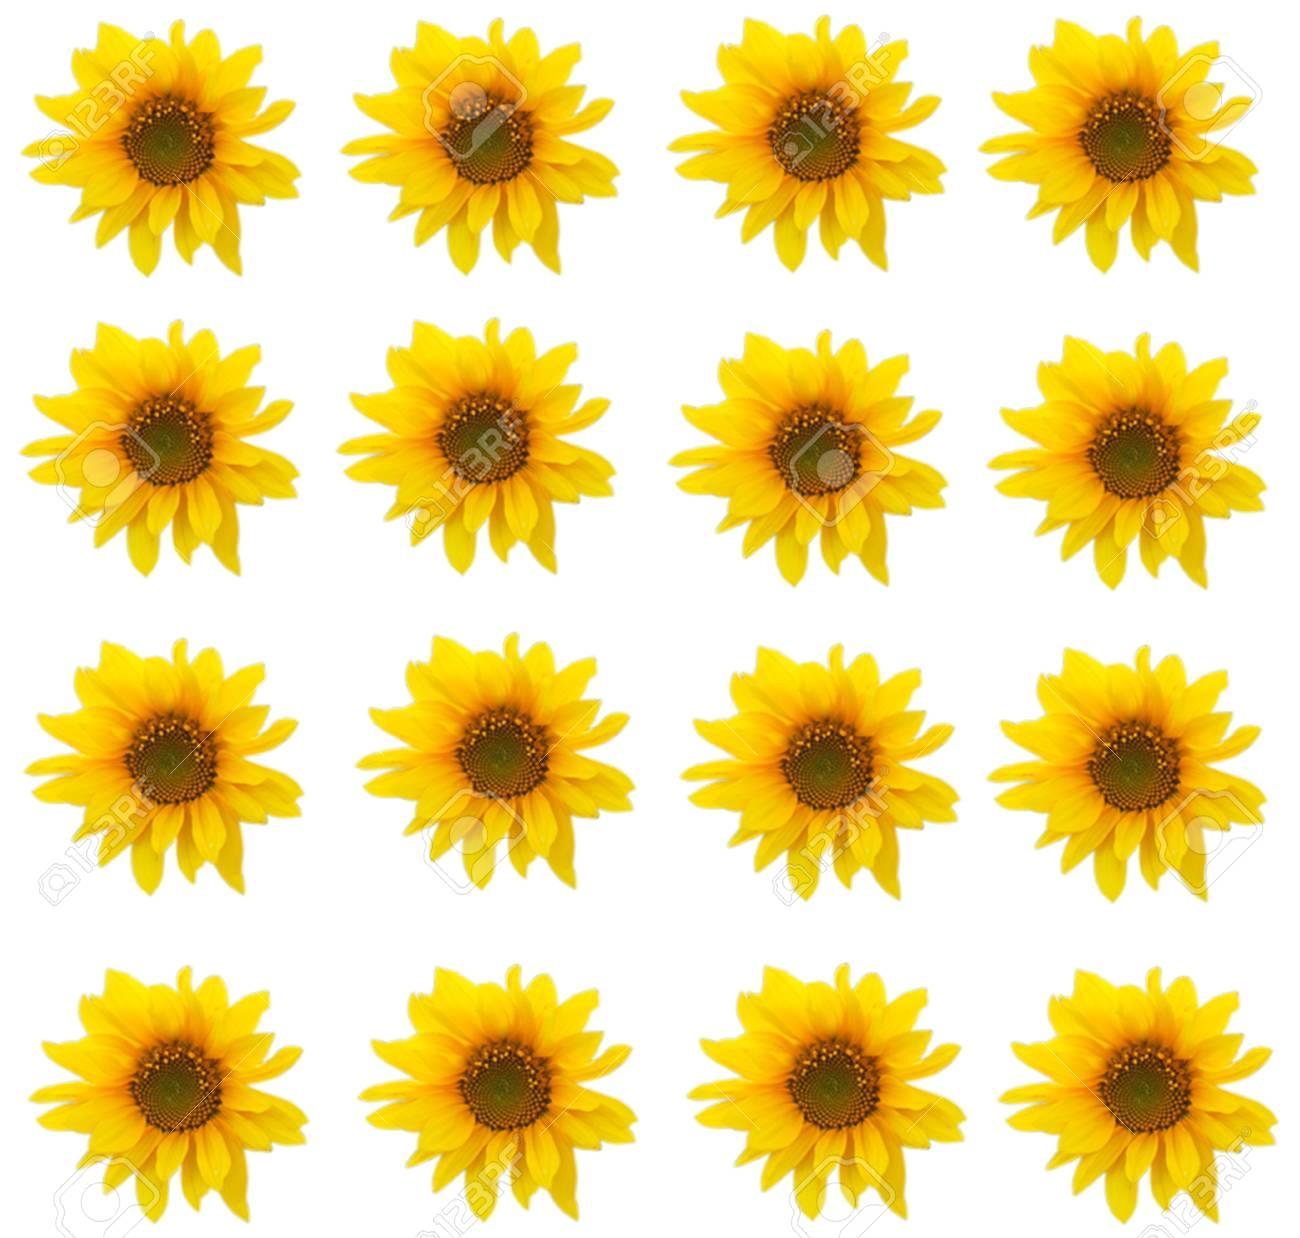 Sunflower. Stock Photo - 11330084